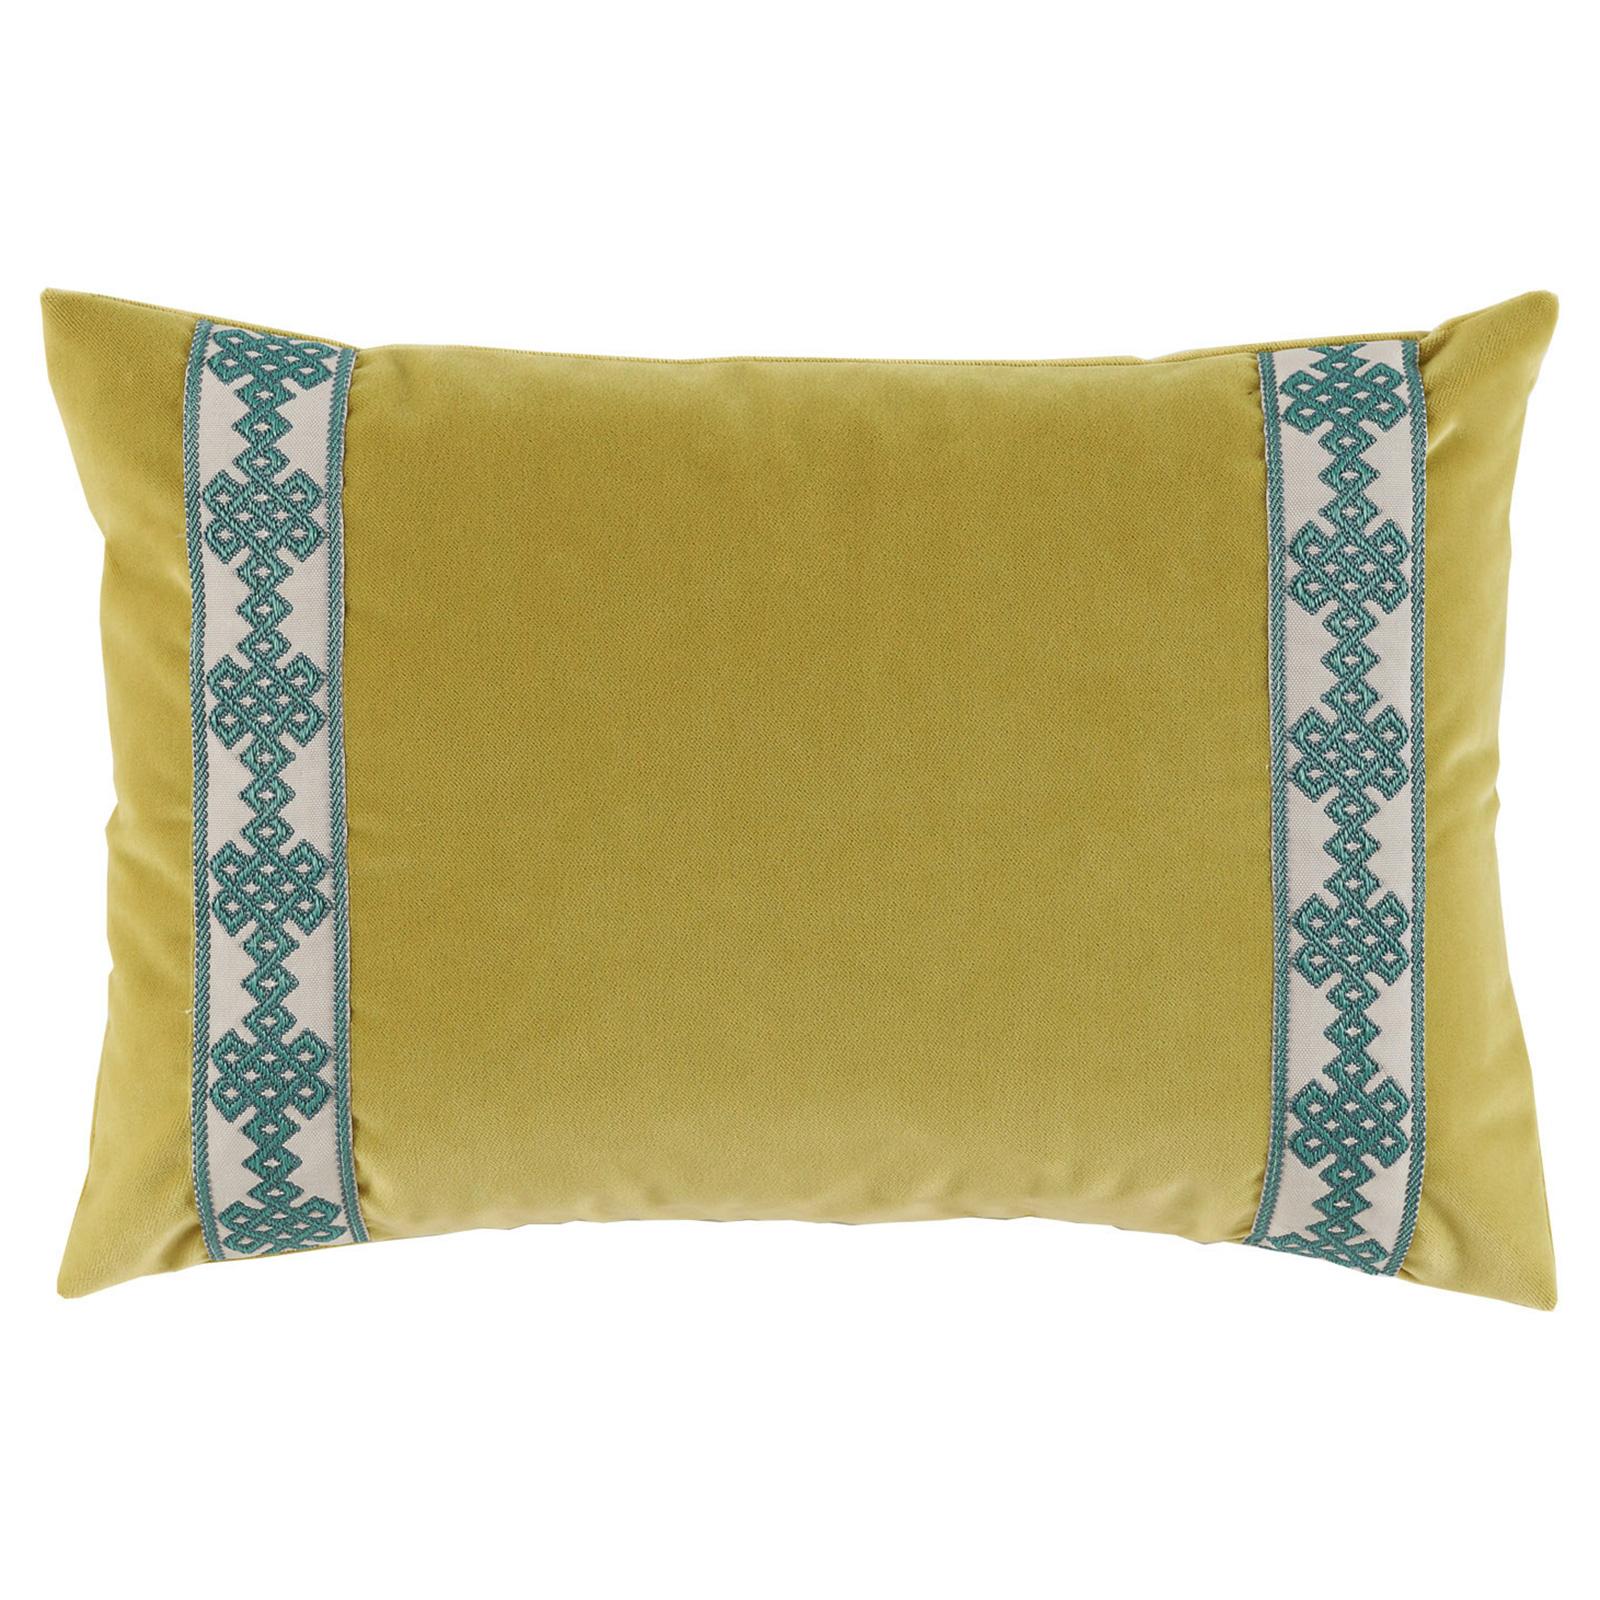 Aida Global Modern Citrus Trellis Trim Velvet Pillow - 13x19